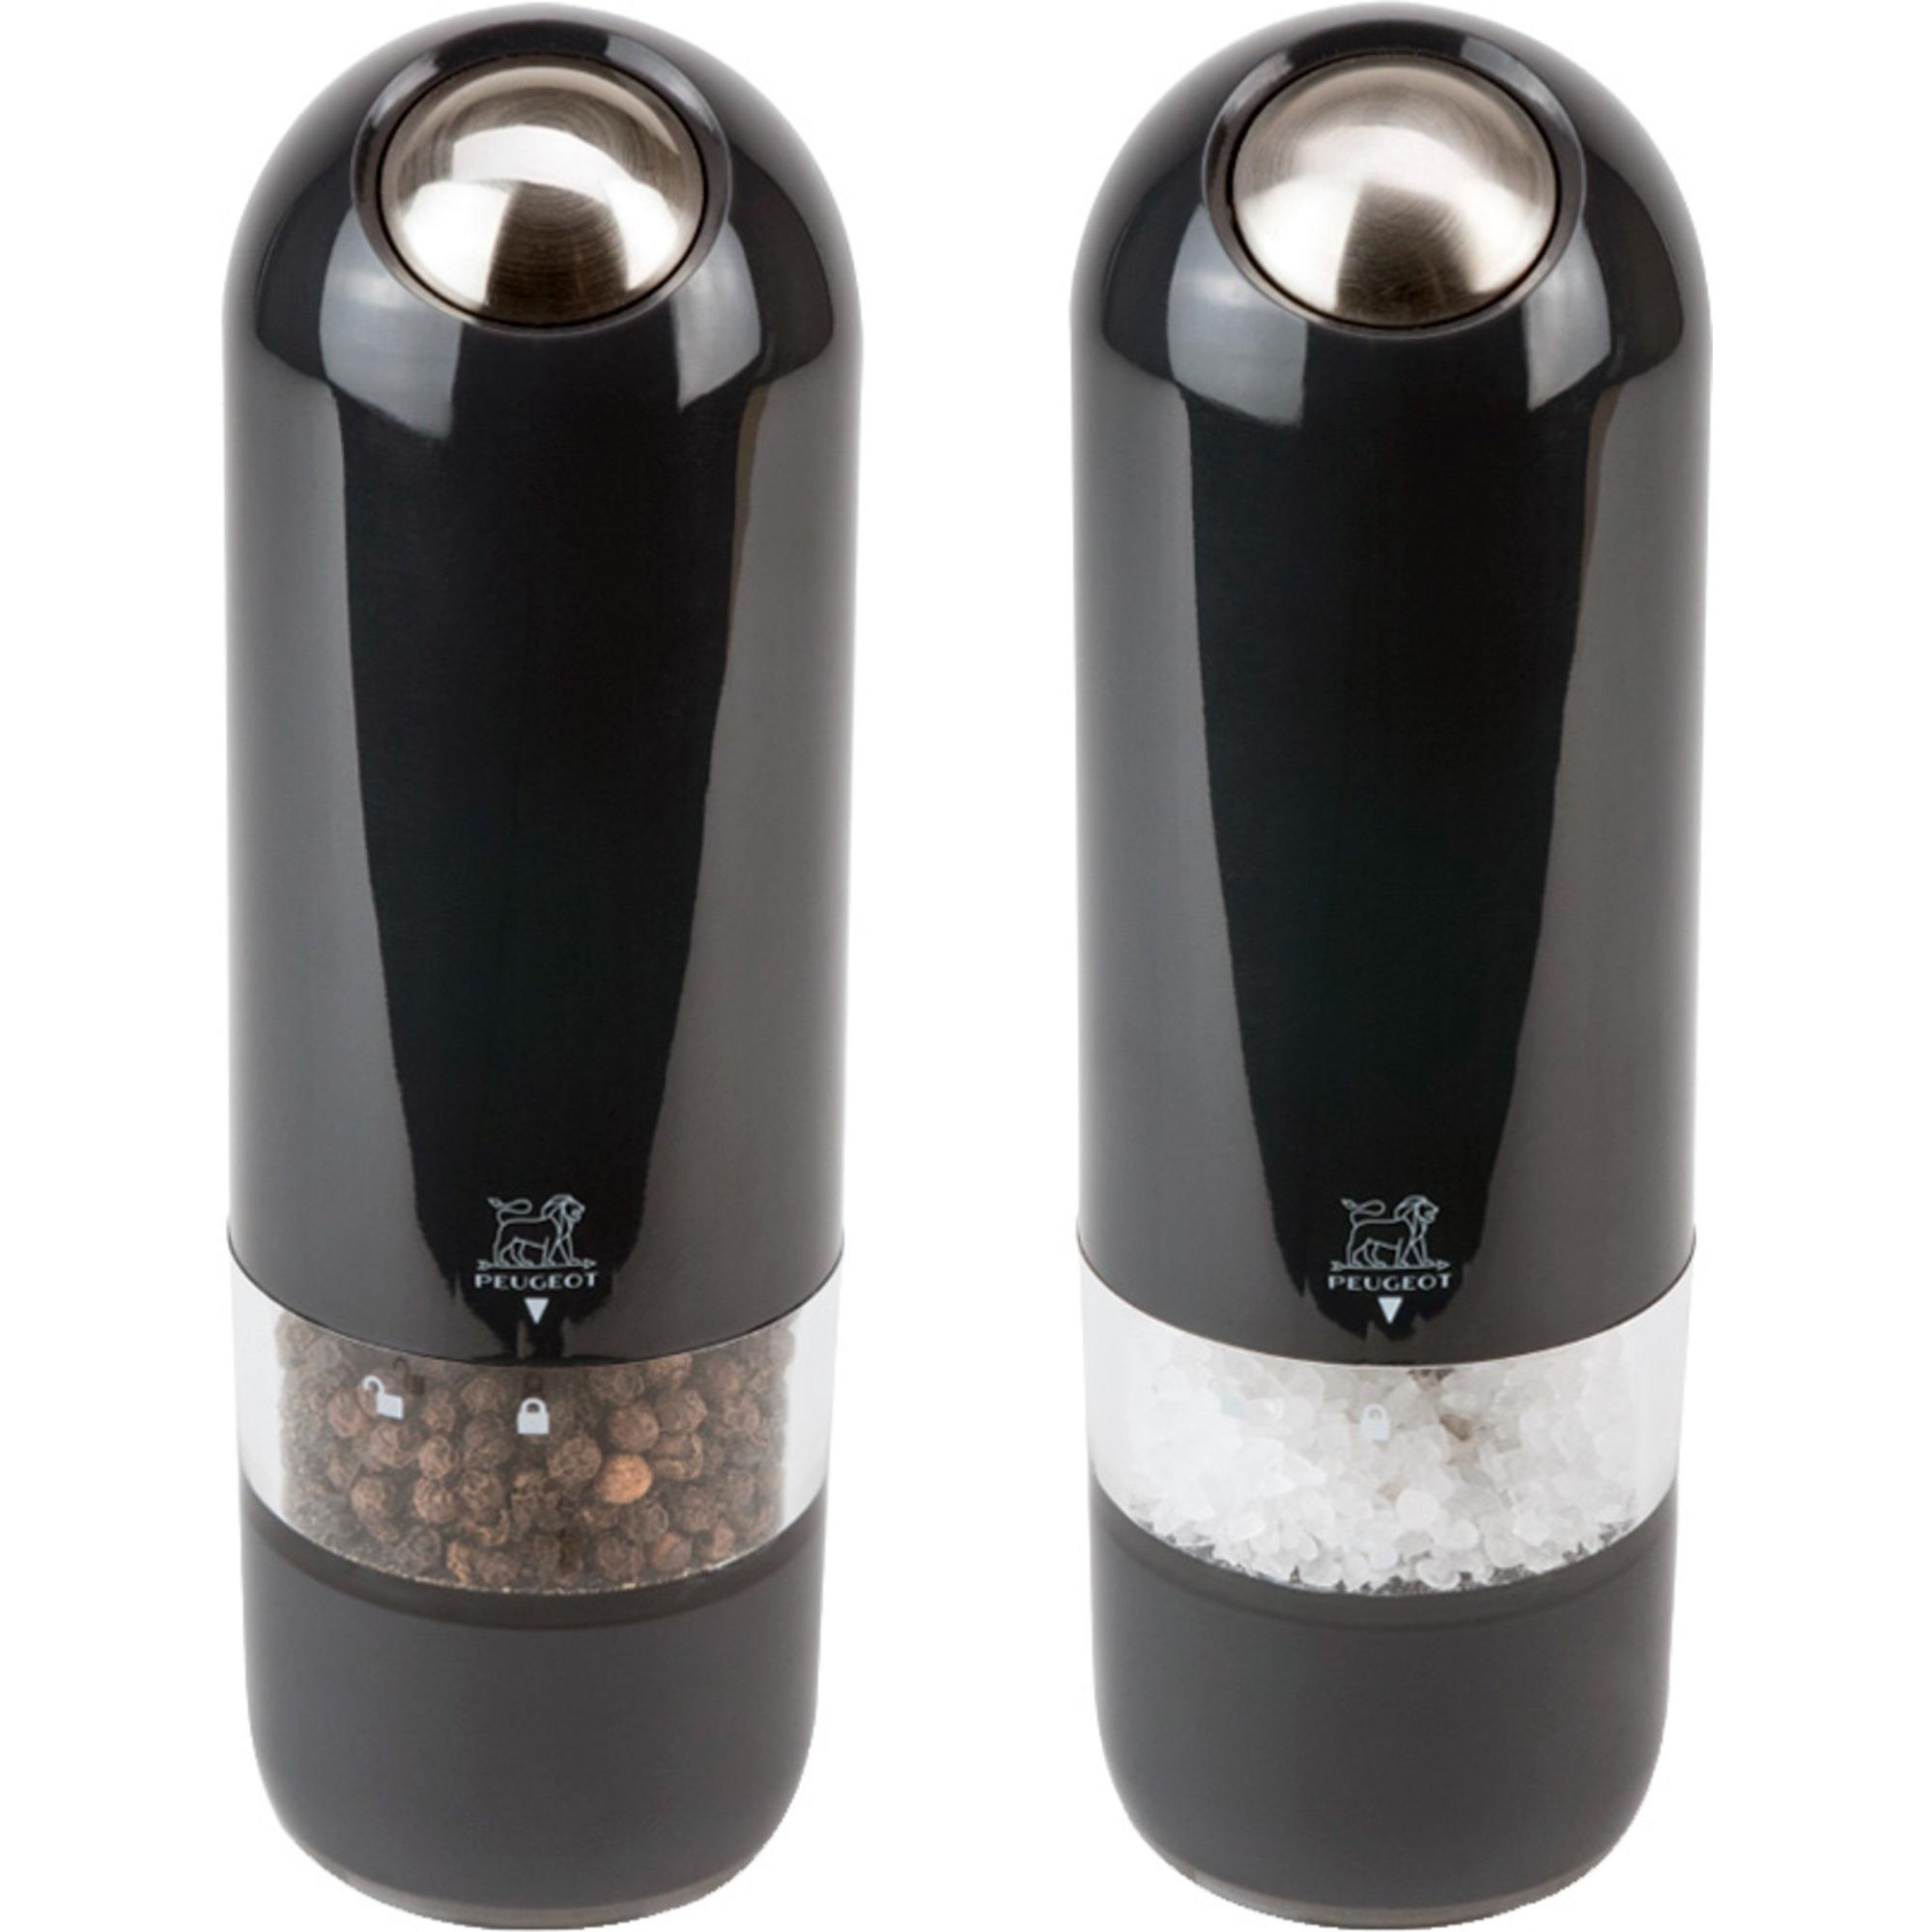 Peugeot Alaska Duo Elektrisk Salt- & Pepparkvarn 17 cm Quartz Grå